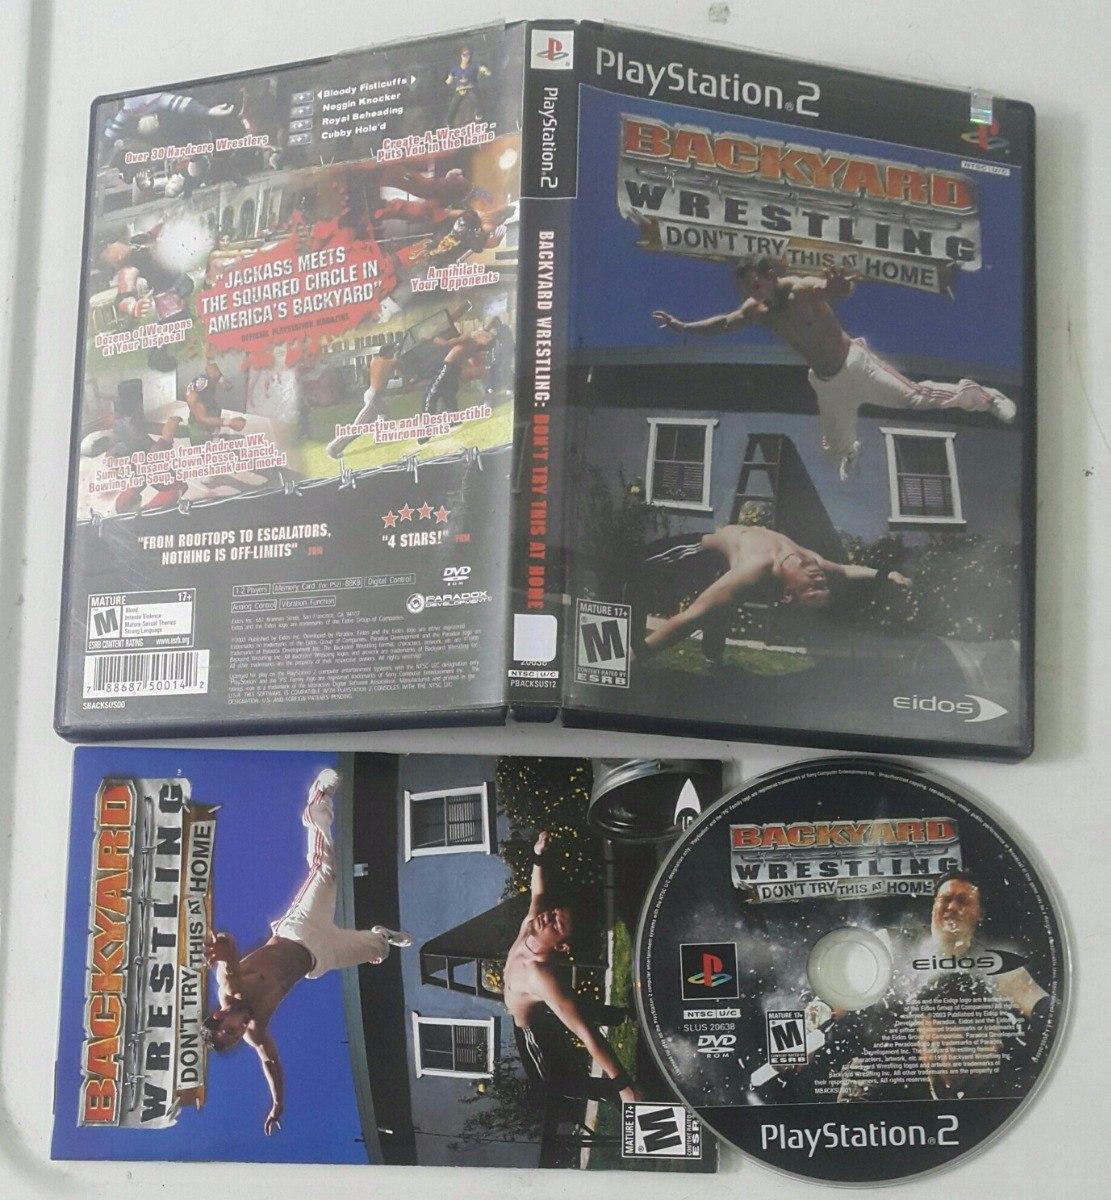 backyard wrestling lucha playstation 2 ps2 29 000 en